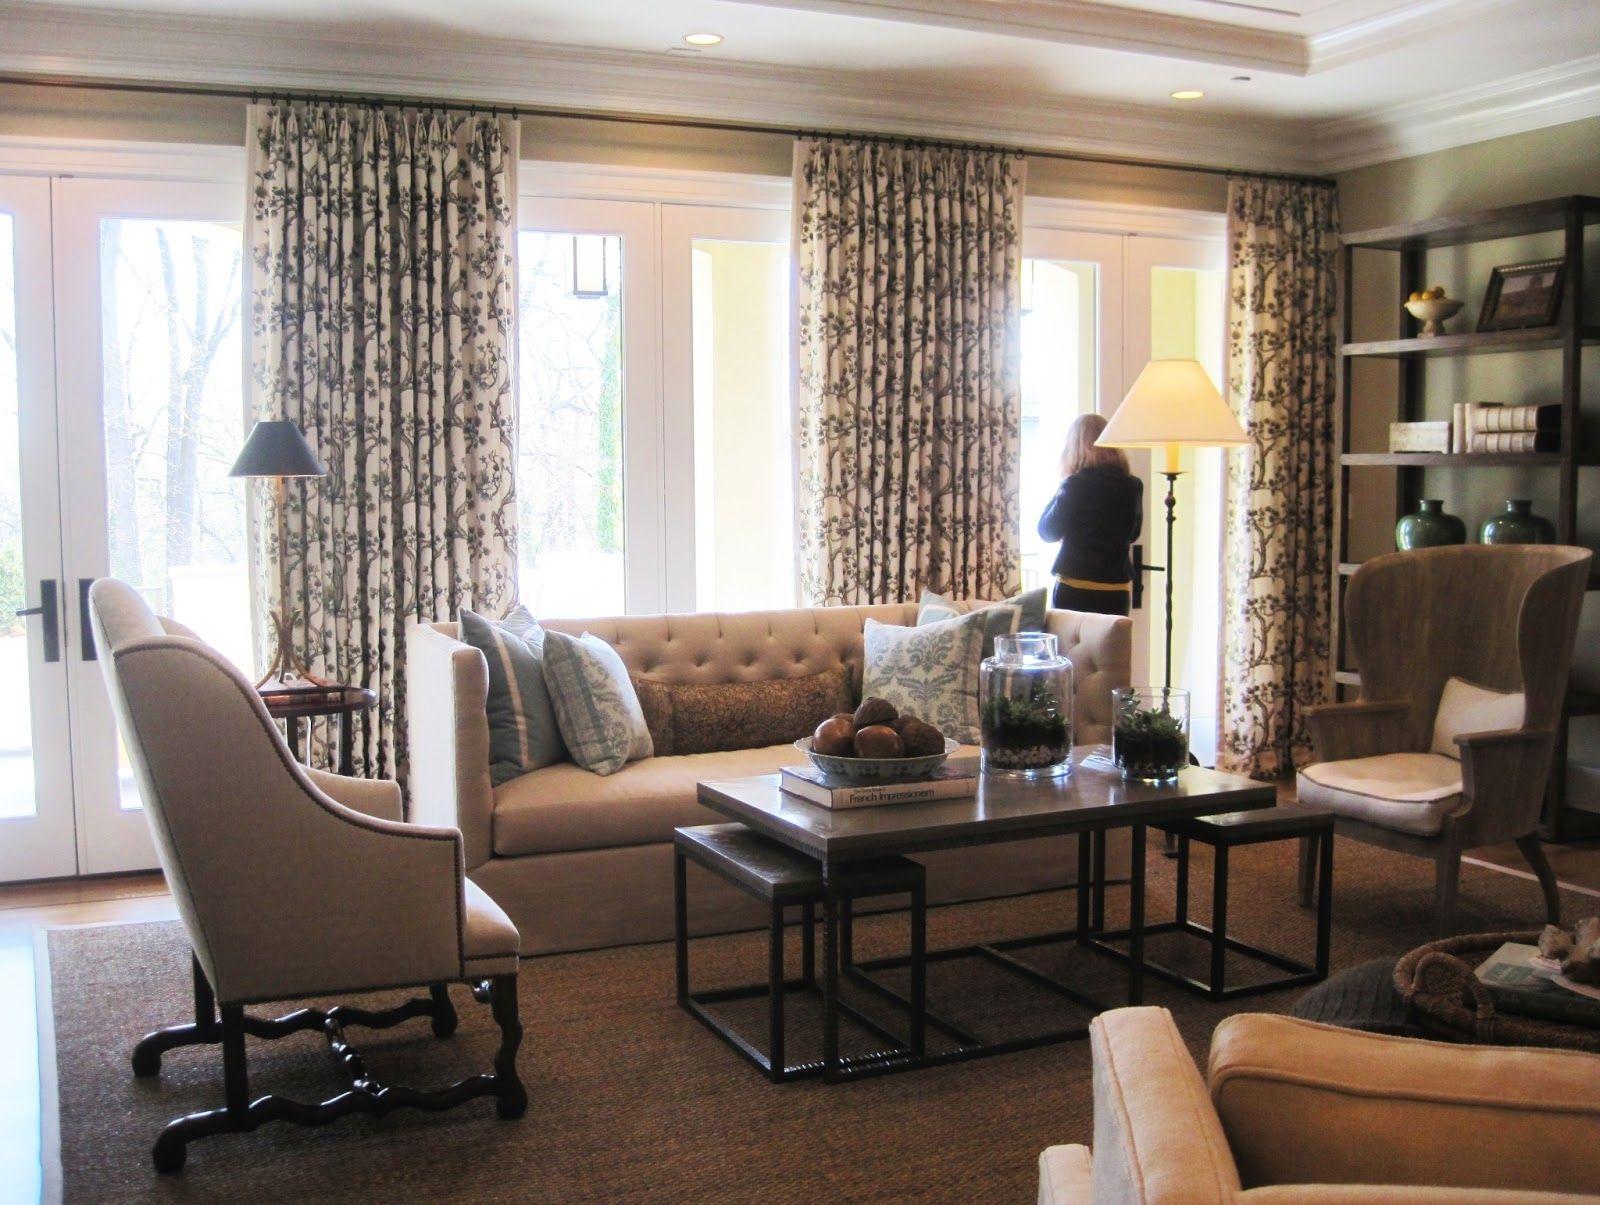 17 Amazing Window Treatment Ideas Add Drama To A Room Living Room Drapes Window Treatments Living Room Living Room Decor Curtains